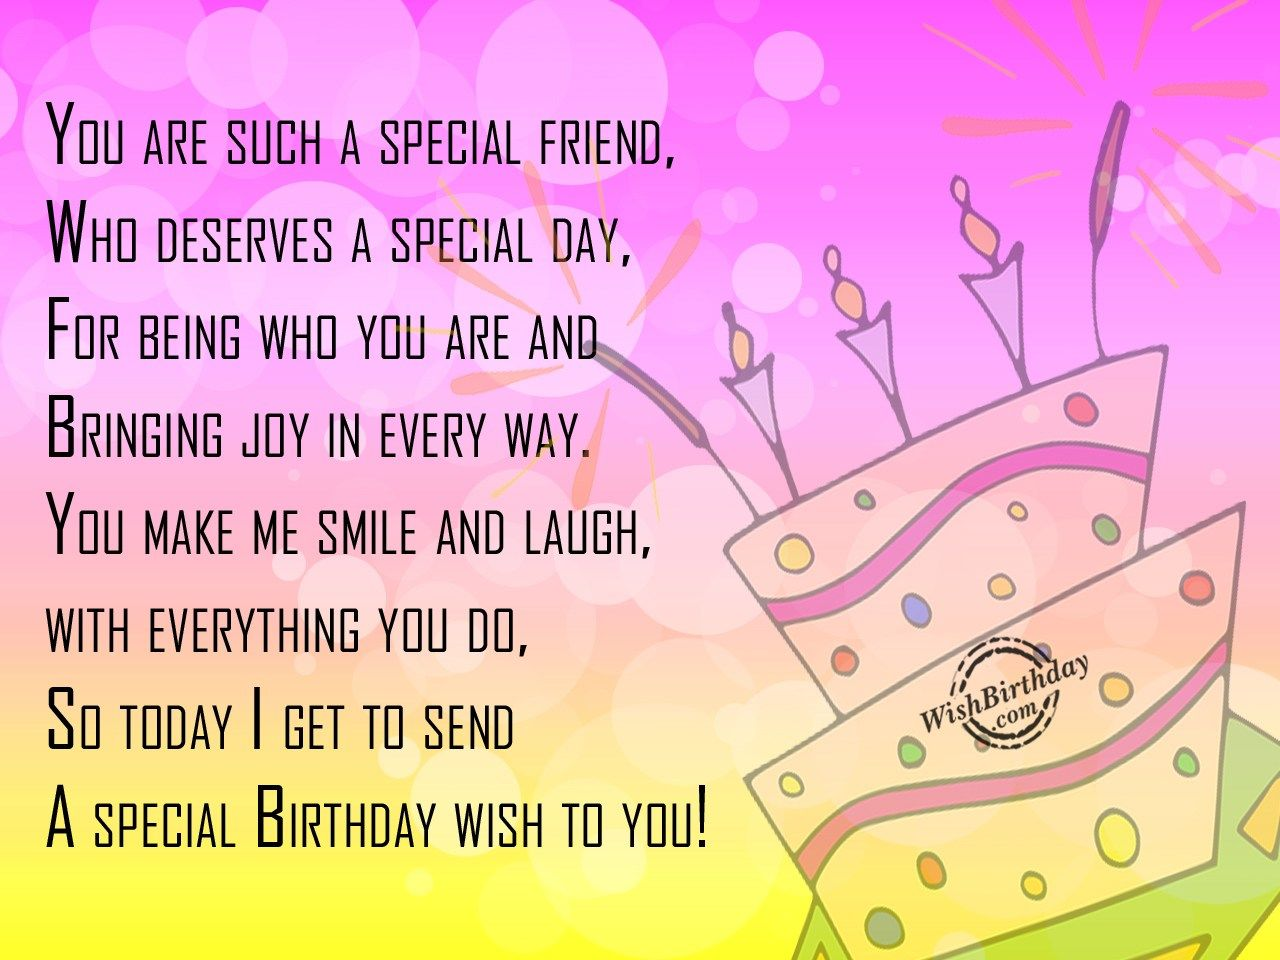 Special birthday wish to you birthday greetings pinterest special birthday wish to you m4hsunfo